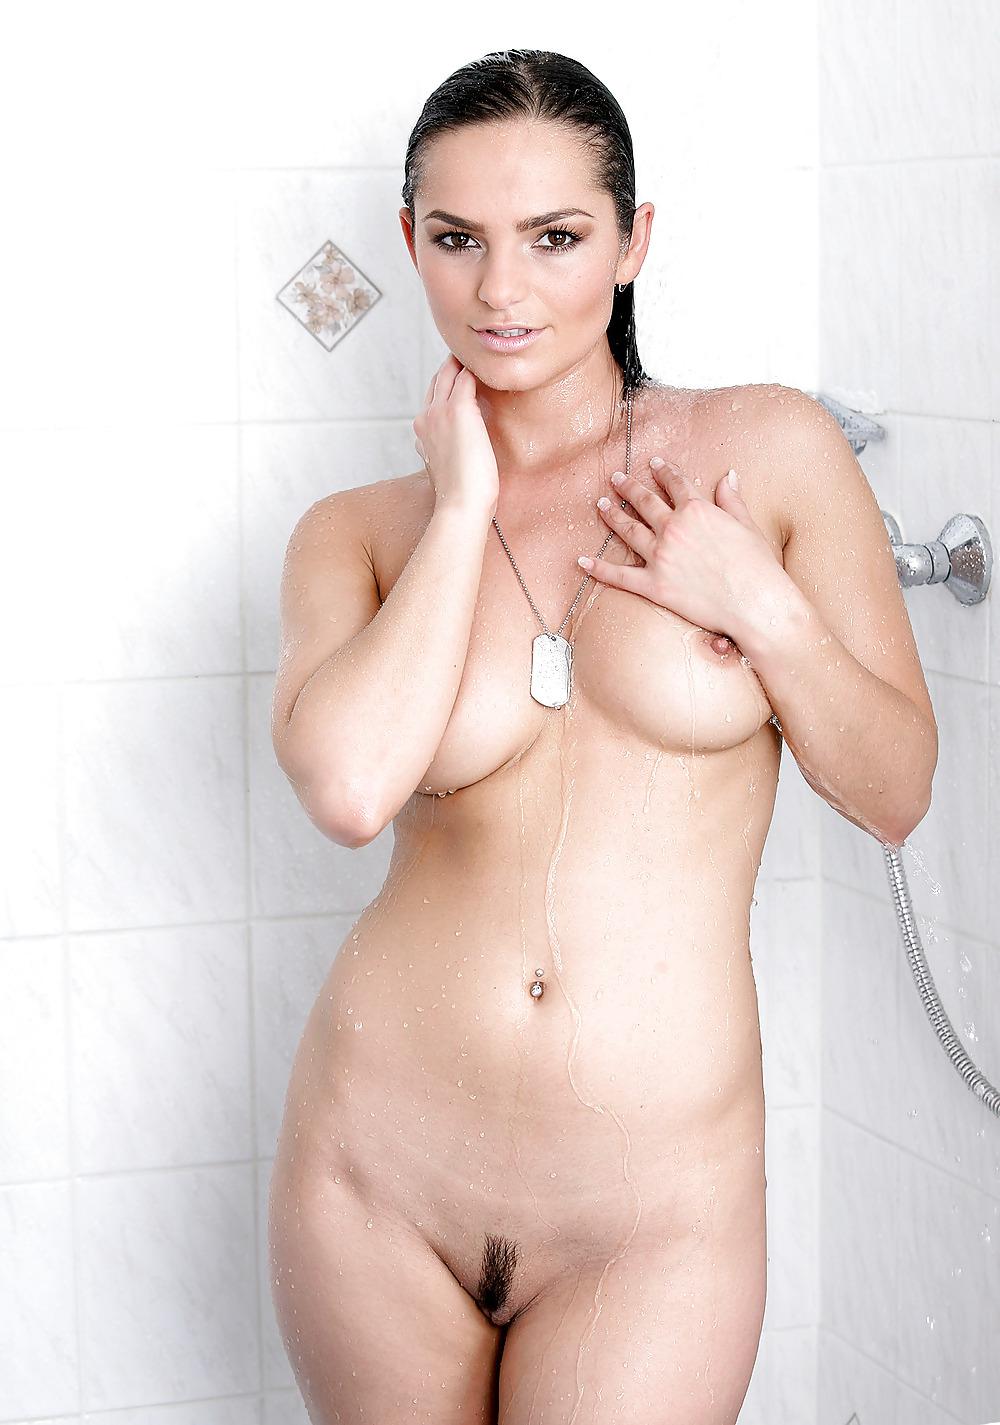 Nude Oznur Asrav naked (39 photo), Topless, Cleavage, Feet, panties 2019